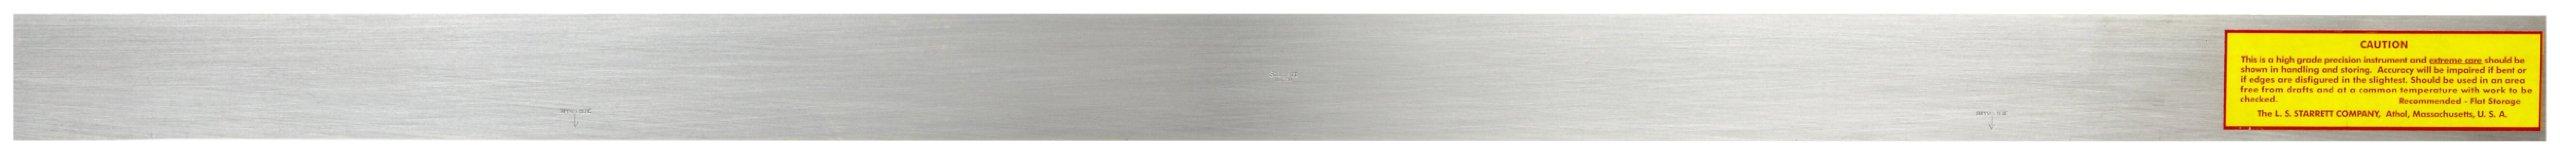 Starrett 380-48 48-Inch Steel Straight Edge